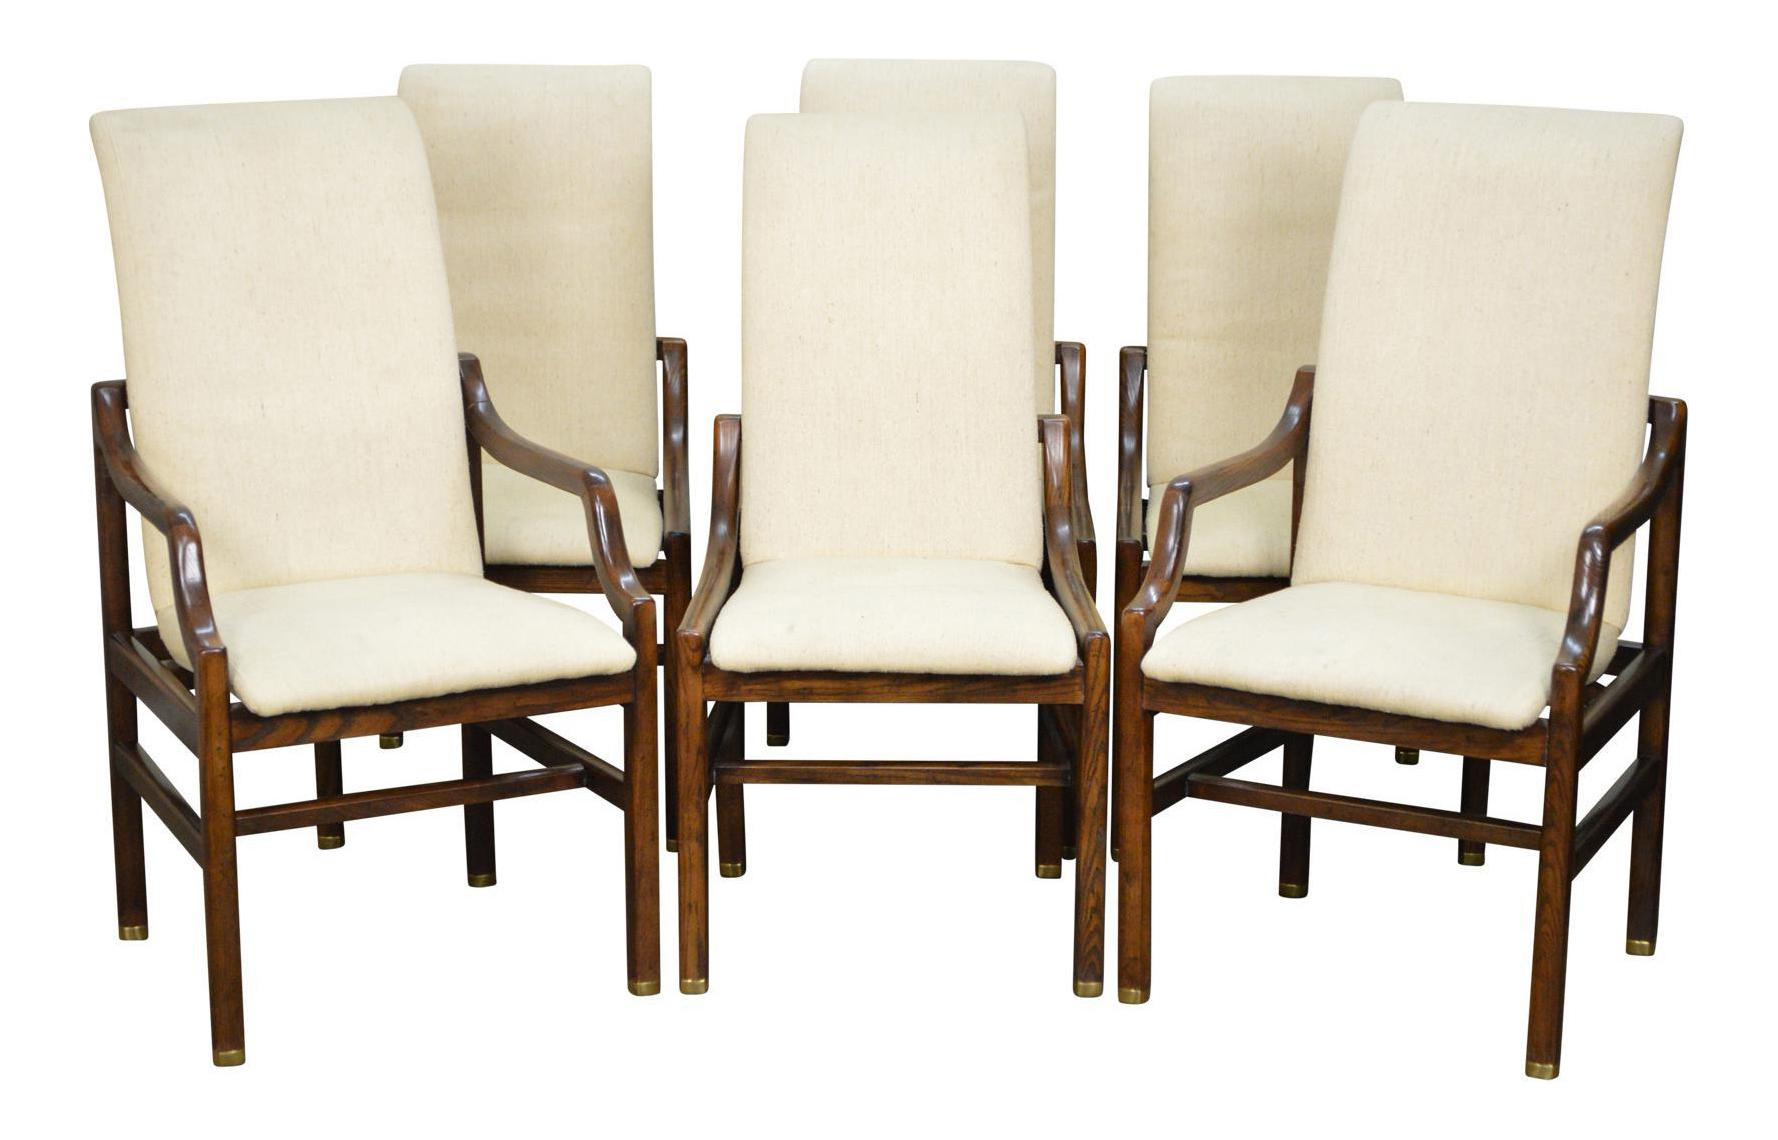 Henredon Mid Century Modern Style Dining Chairs   Set Of 6